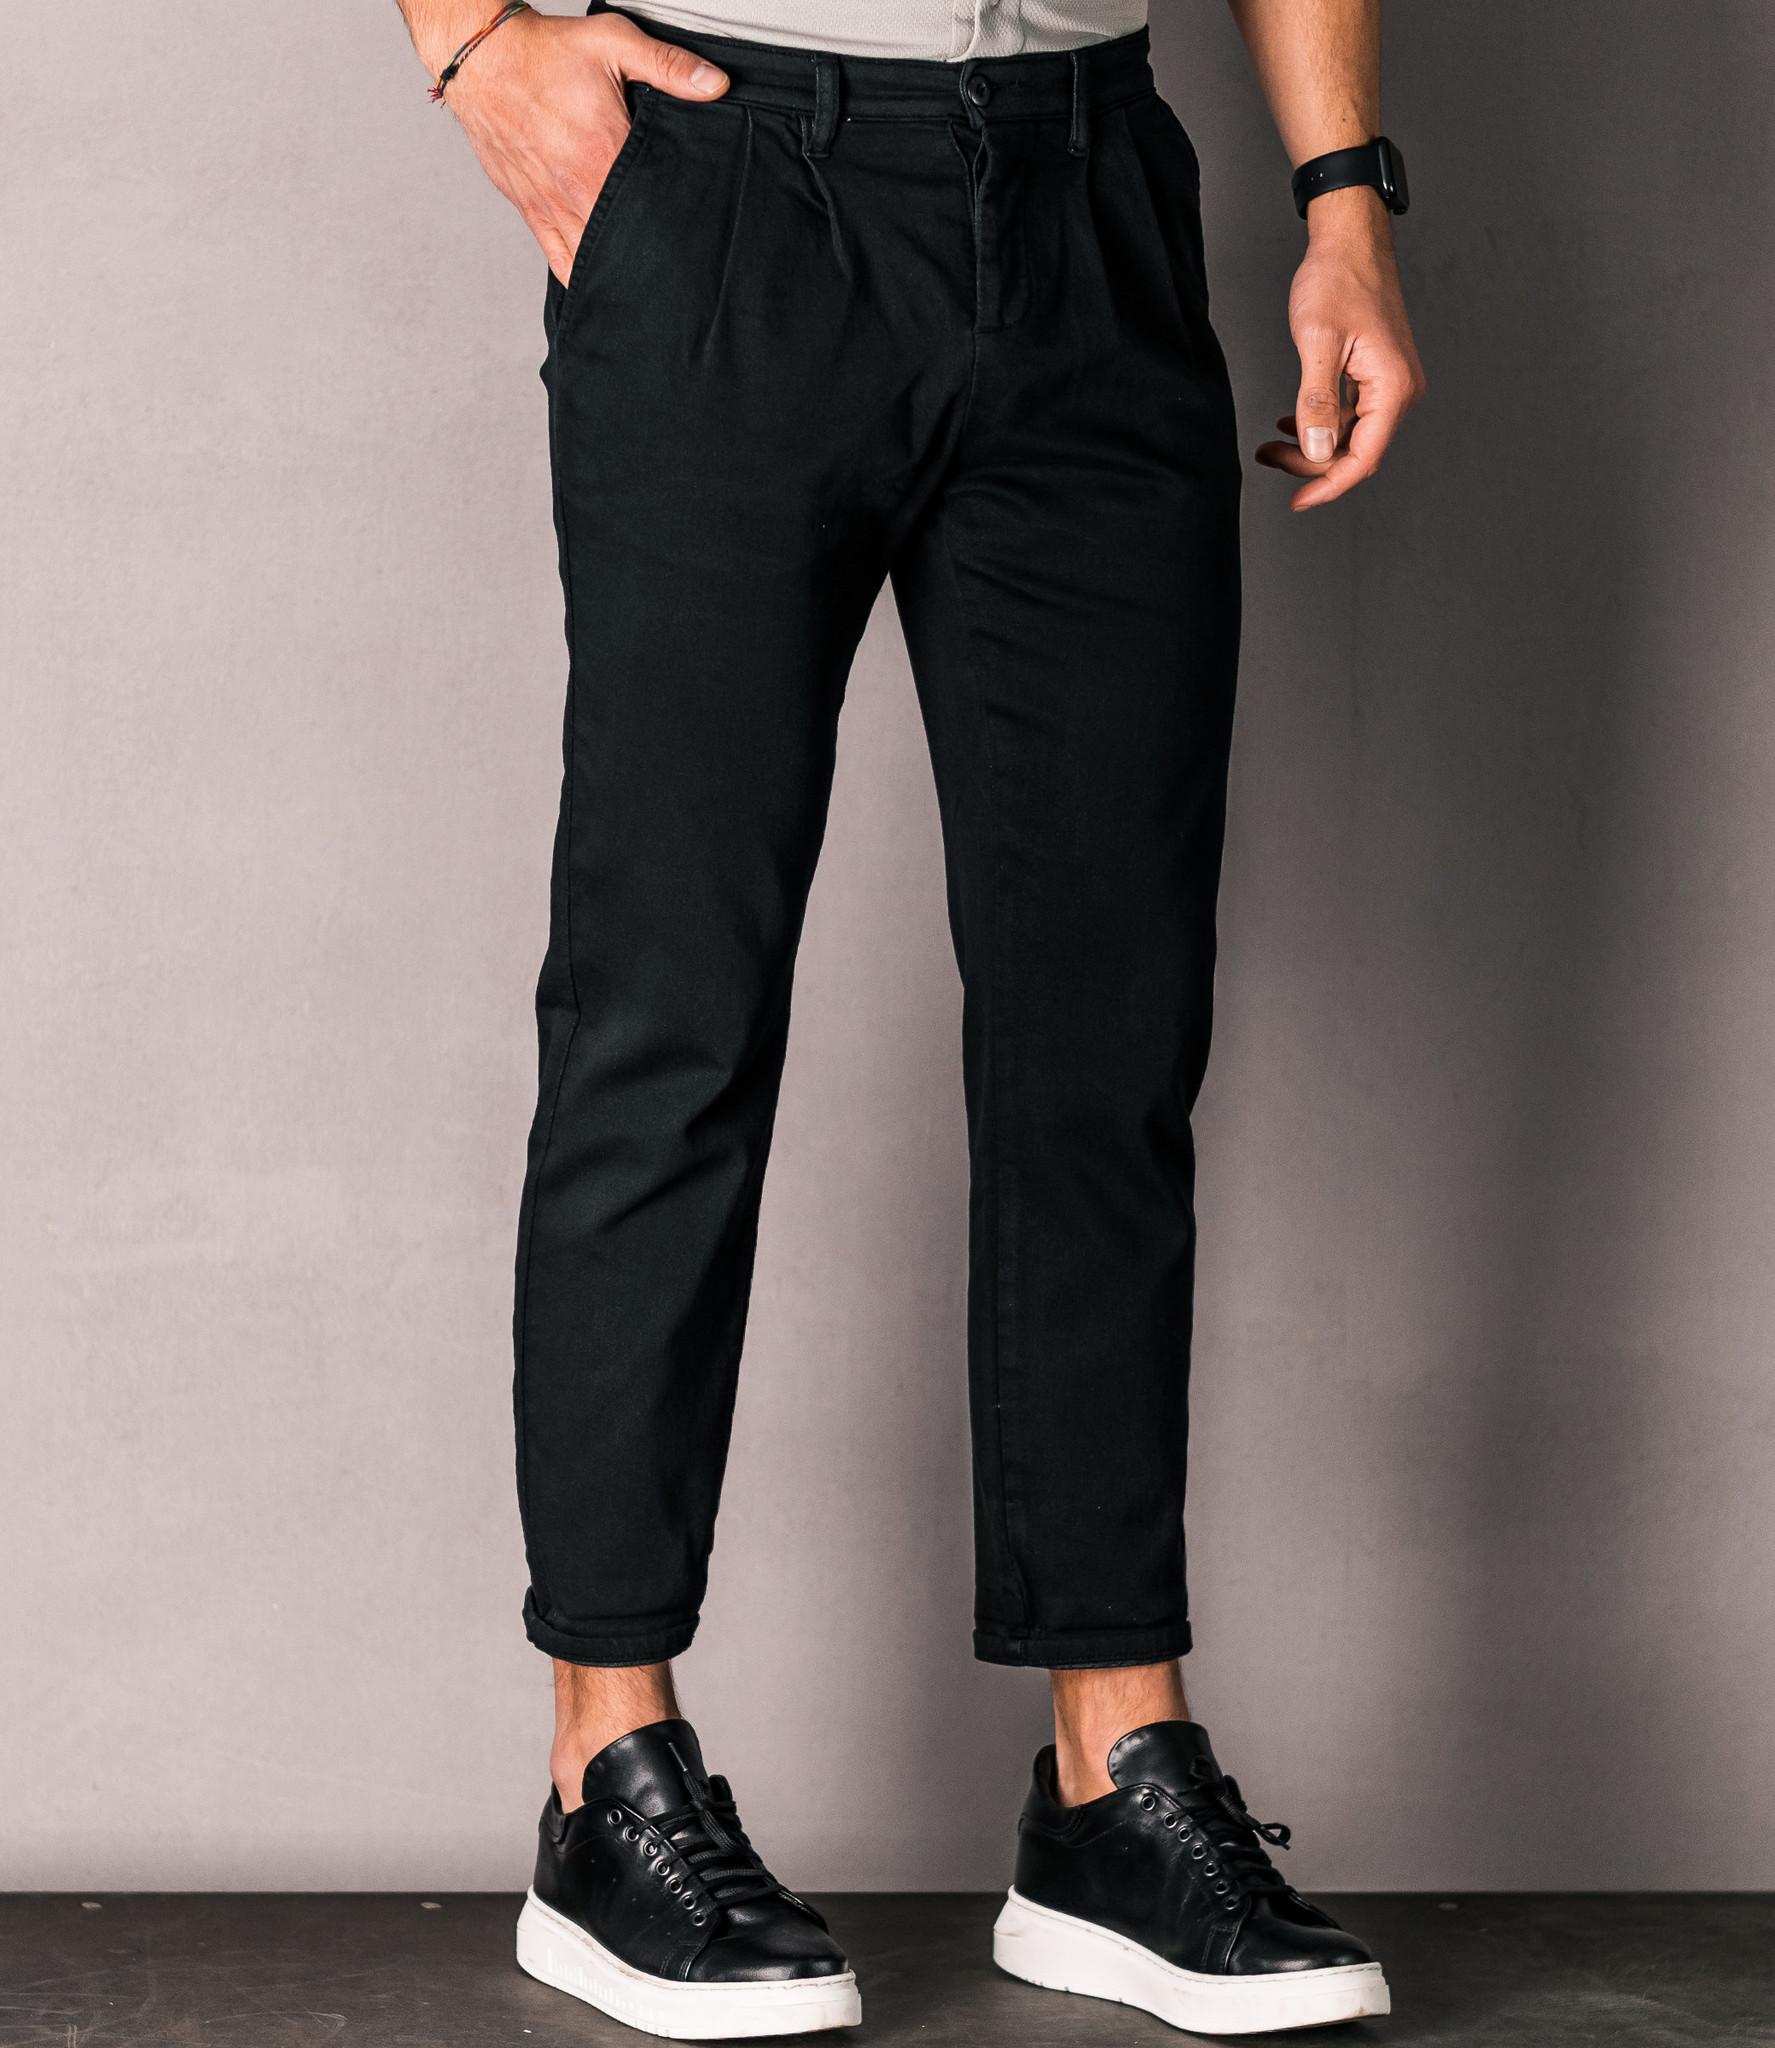 Zumo Carrot Fit Pants IRVING Black